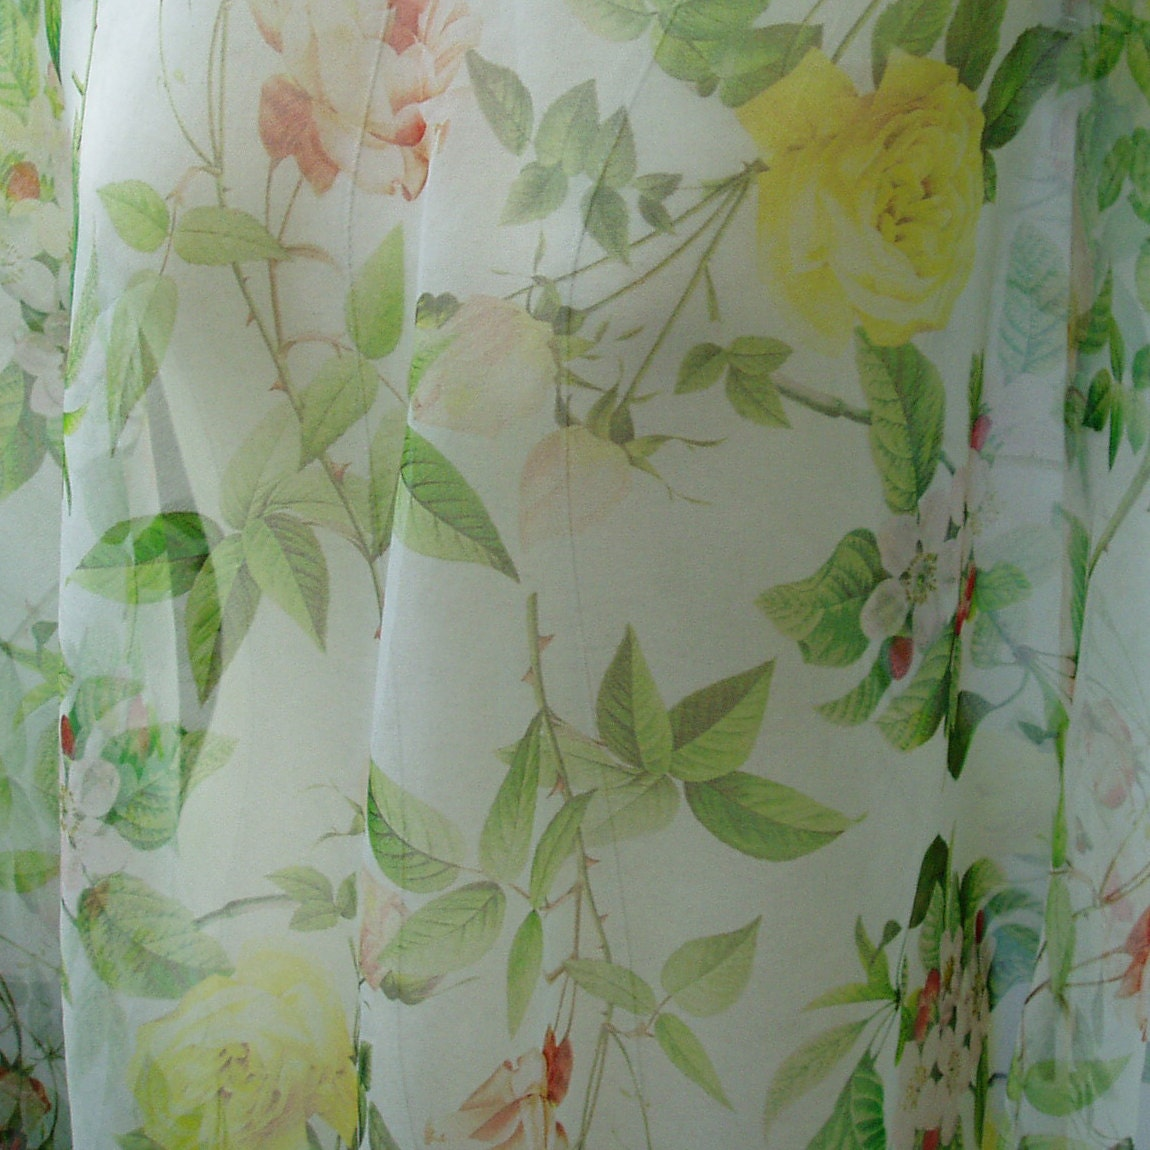 09893ceab79ff pure silk organza fabric floral print pattern 55